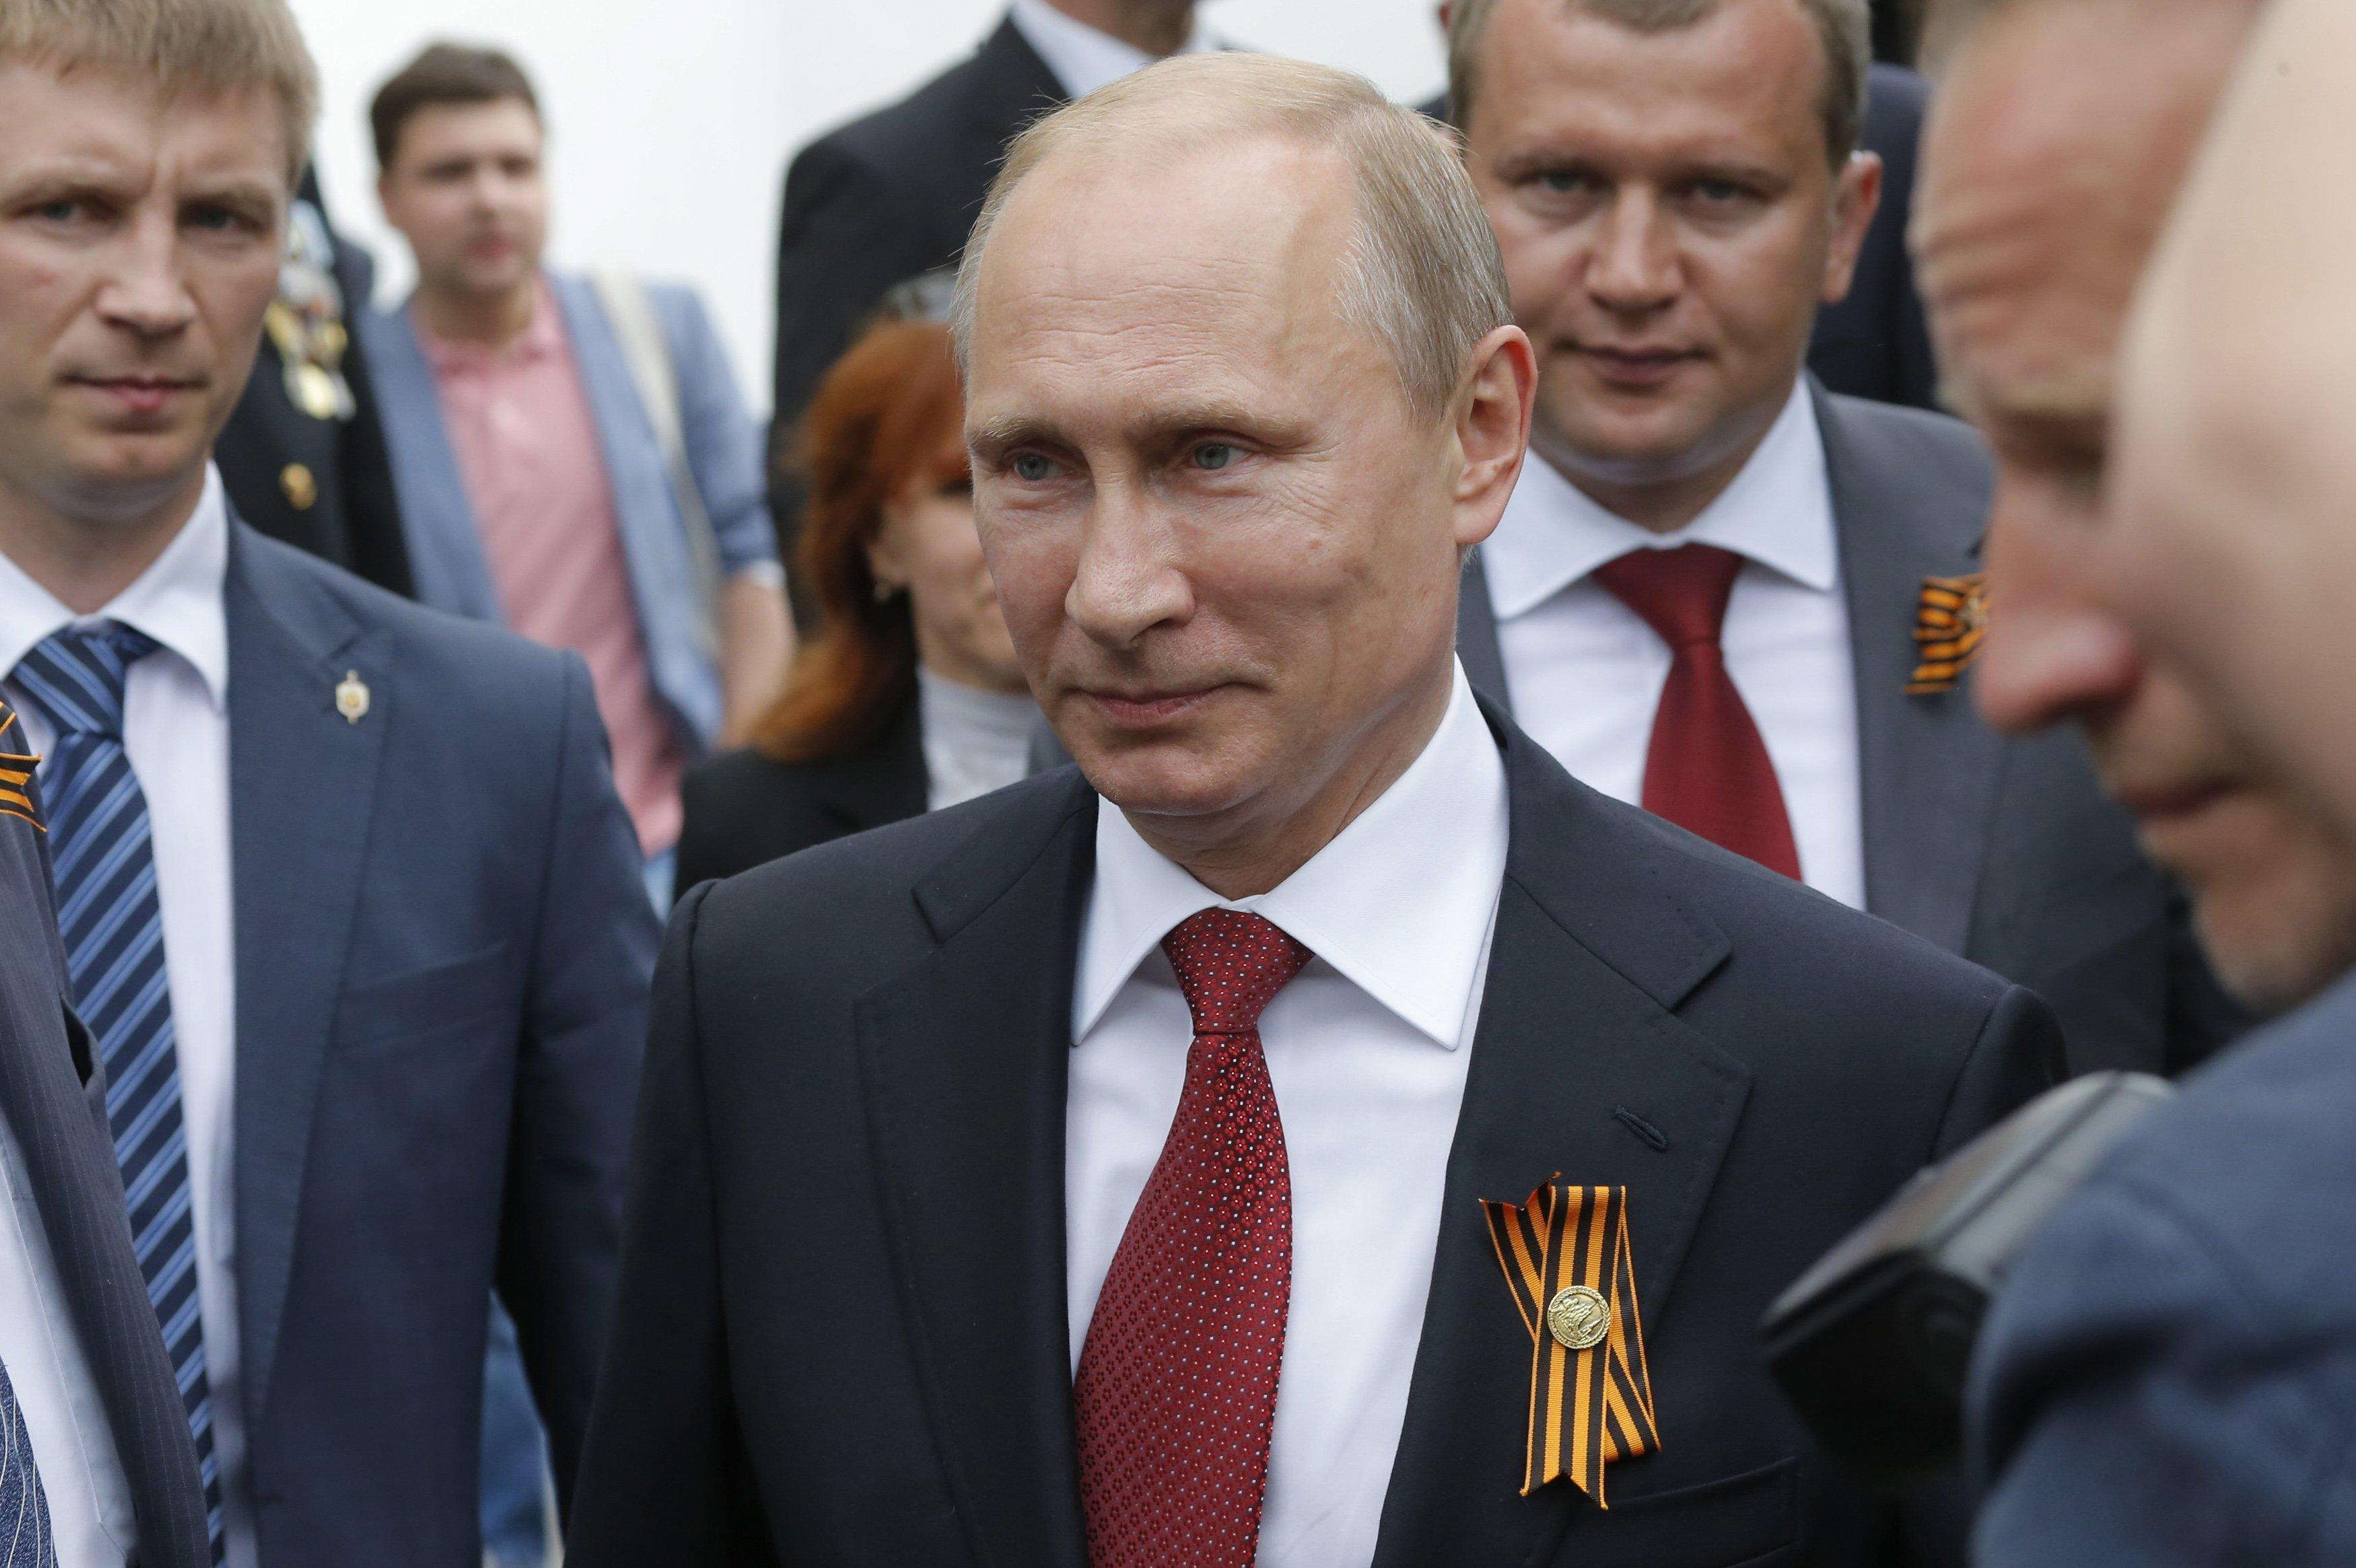 Russian President Vladimir Putin on Victory day in Sevastopol May 9, 2014.